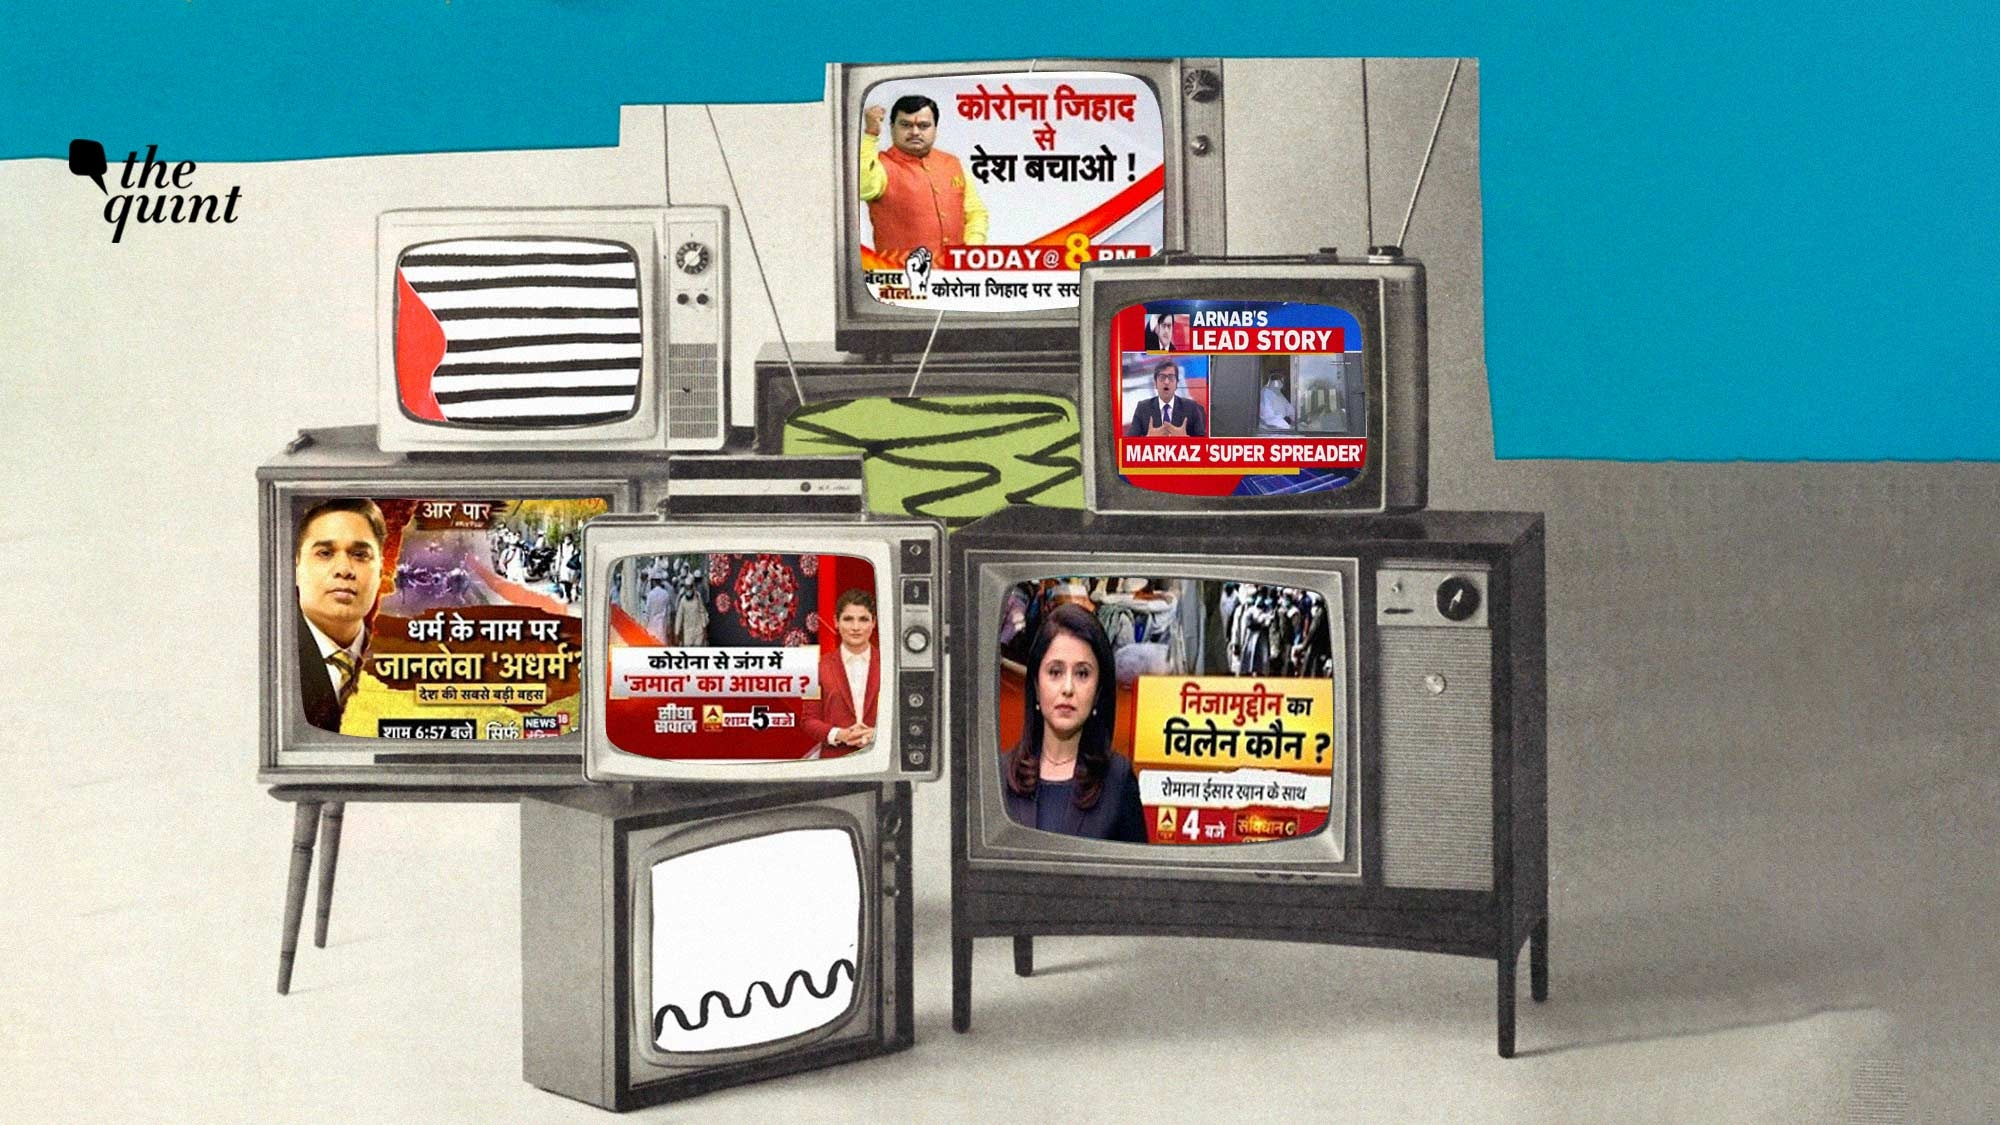 Tablighi Jamaat Coronavirus Hotspots: Is Media Coverage Biased?